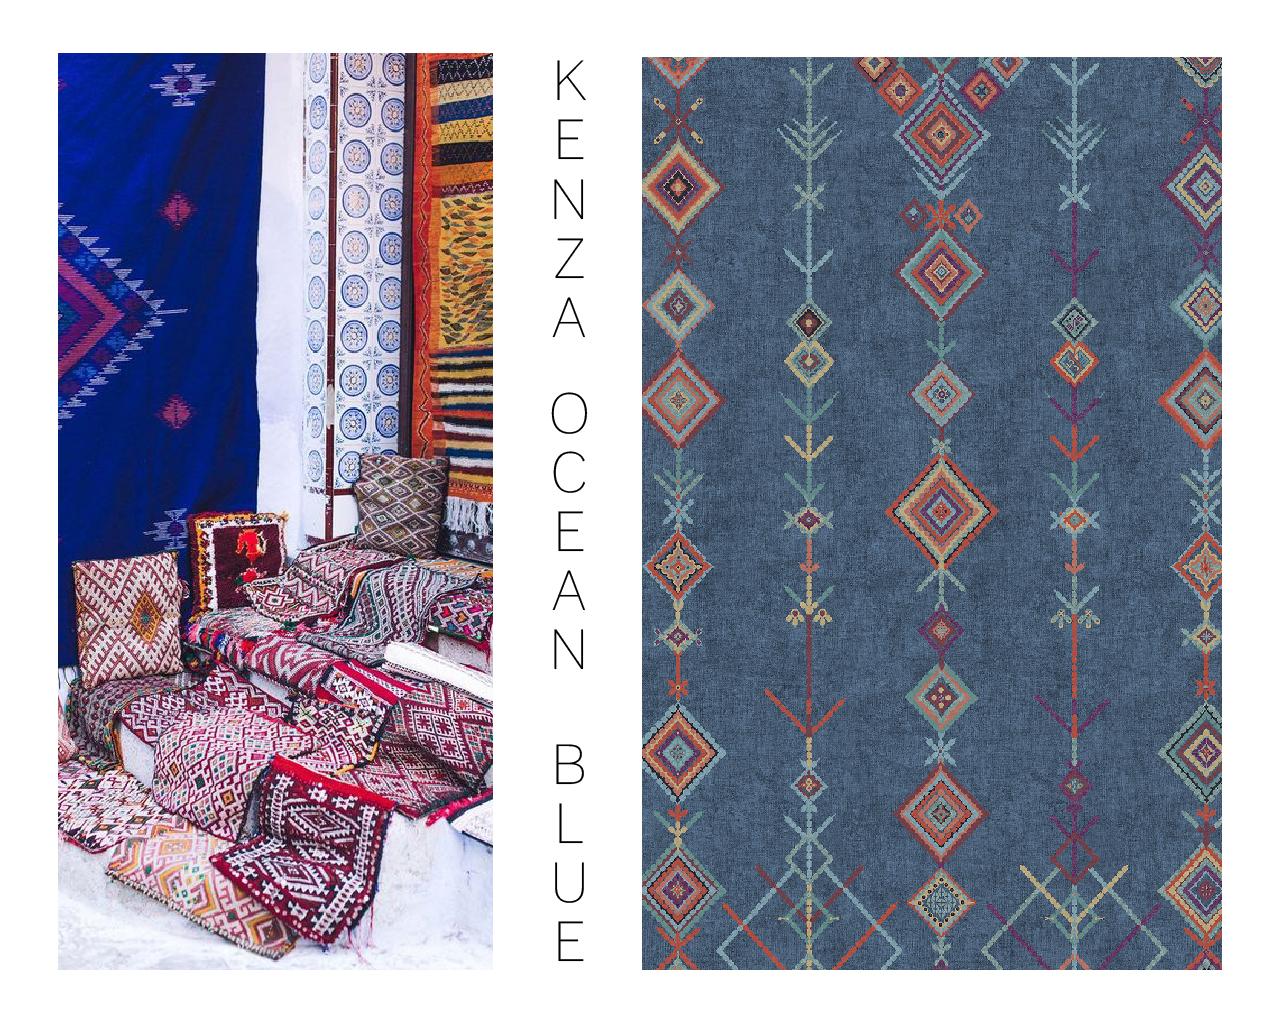 Colorful Kenza blue Moroccan rug